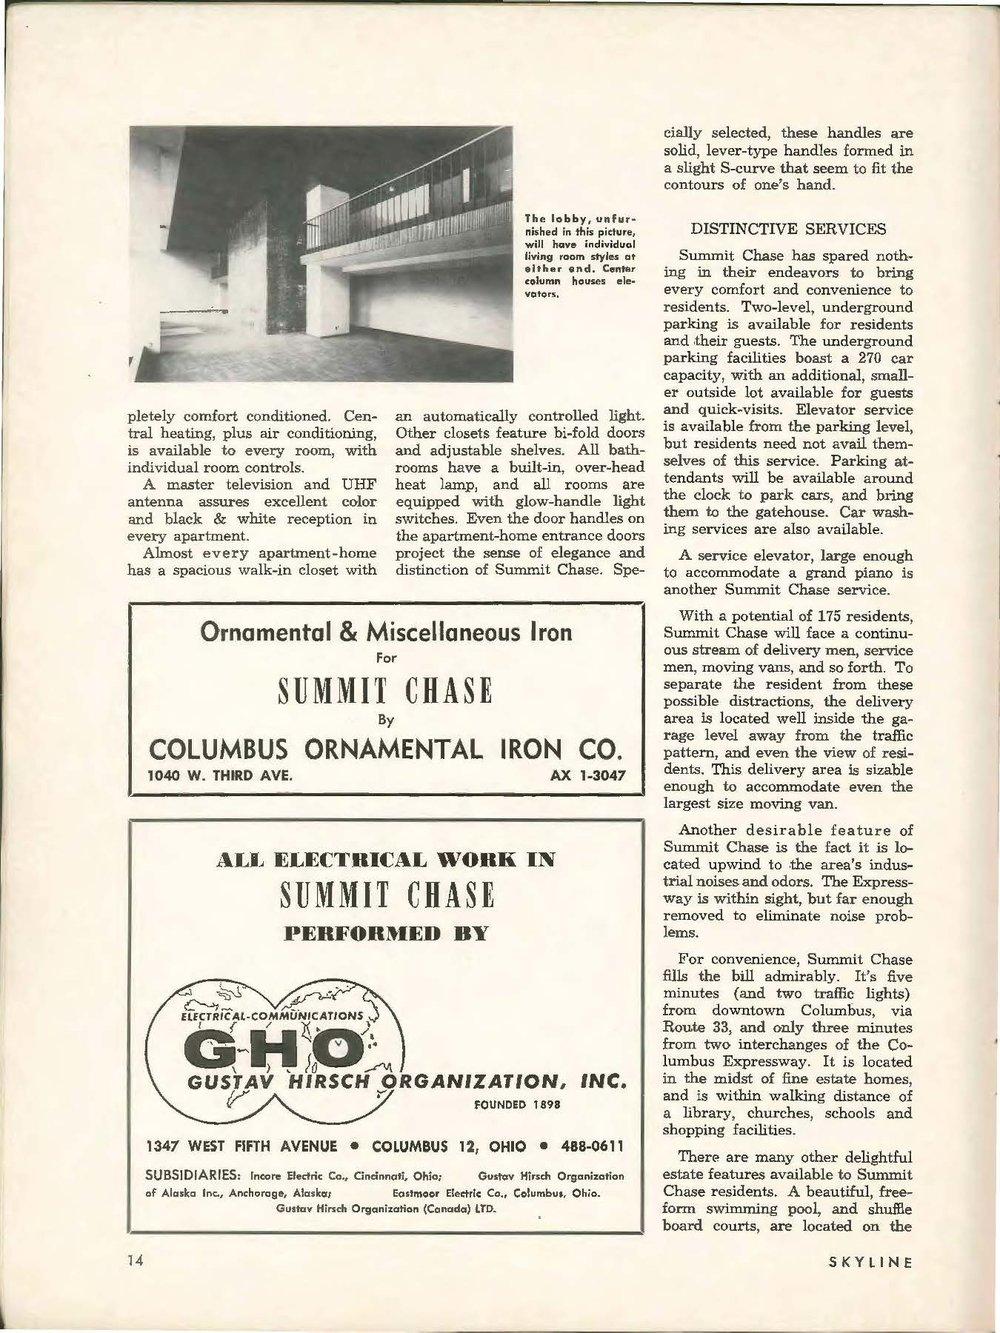 Skyline 1966_Page_14.jpg